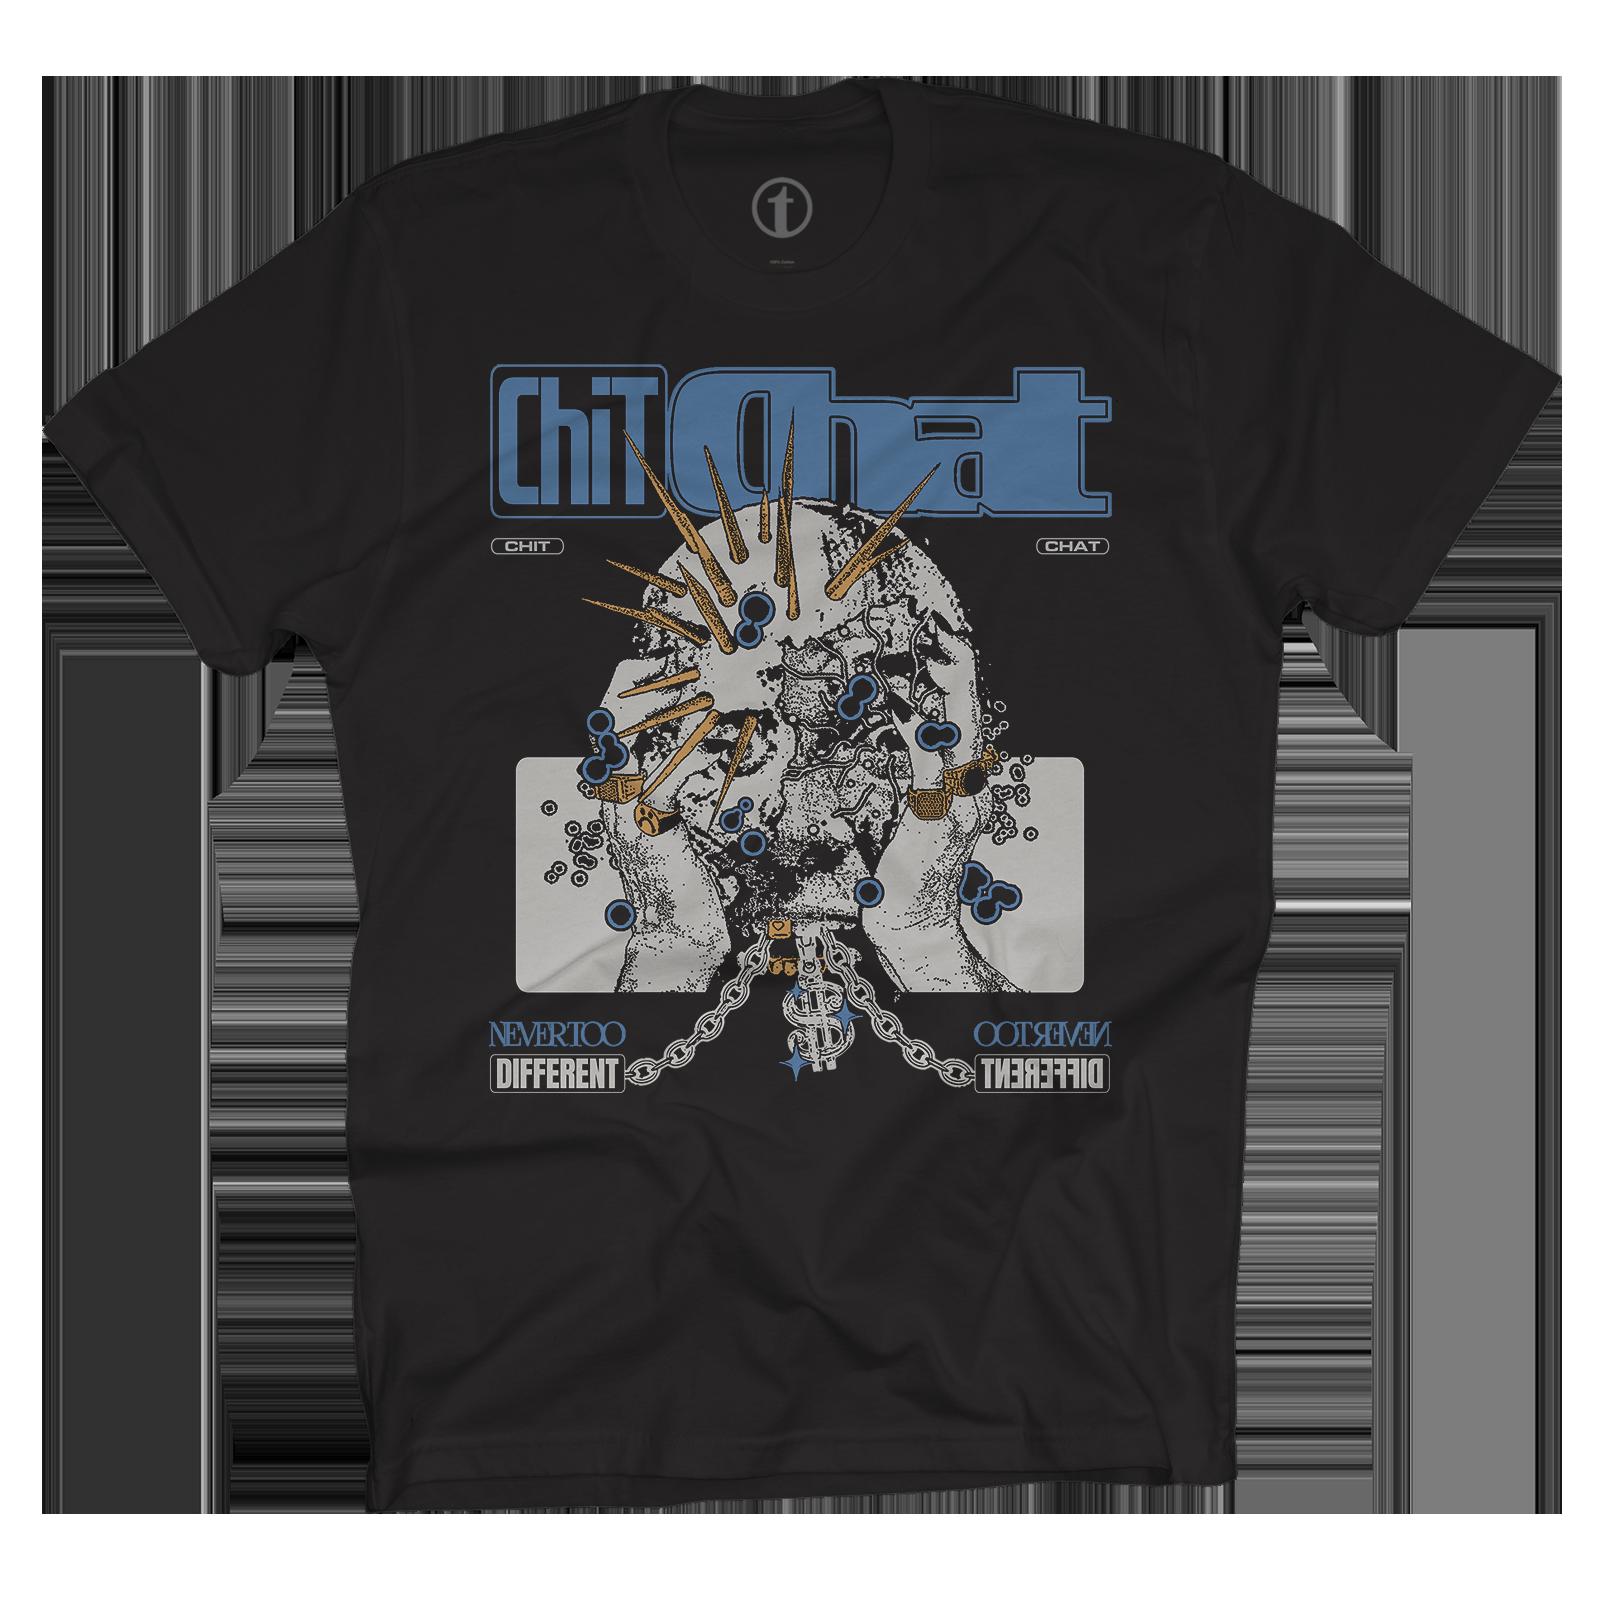 BLUE CHIT CHAT T-SHIRT